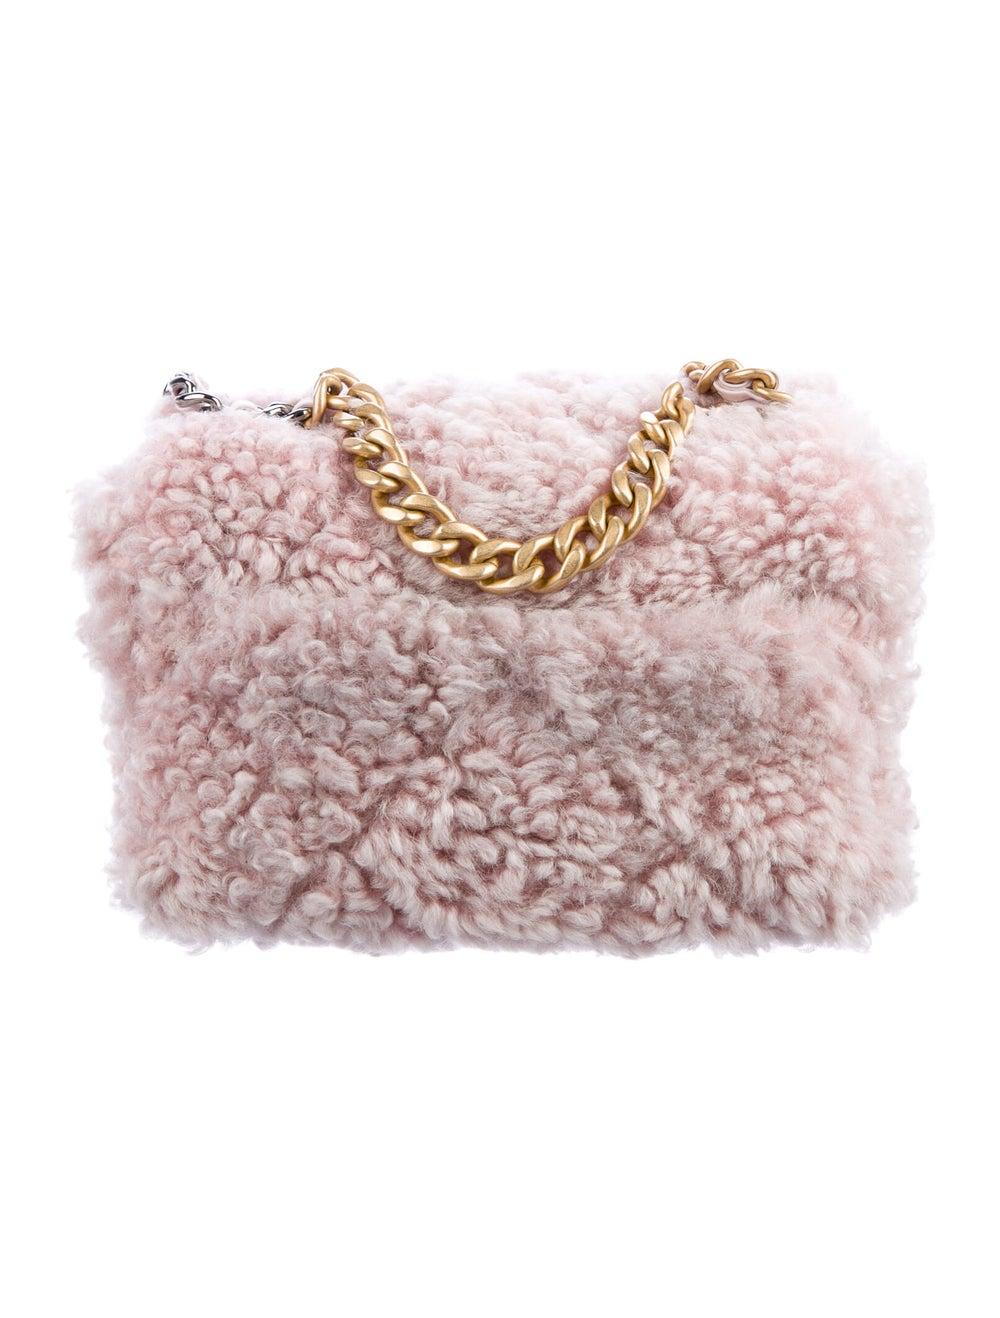 Chanel Shearling 19 Flap Bag Pink - image 4